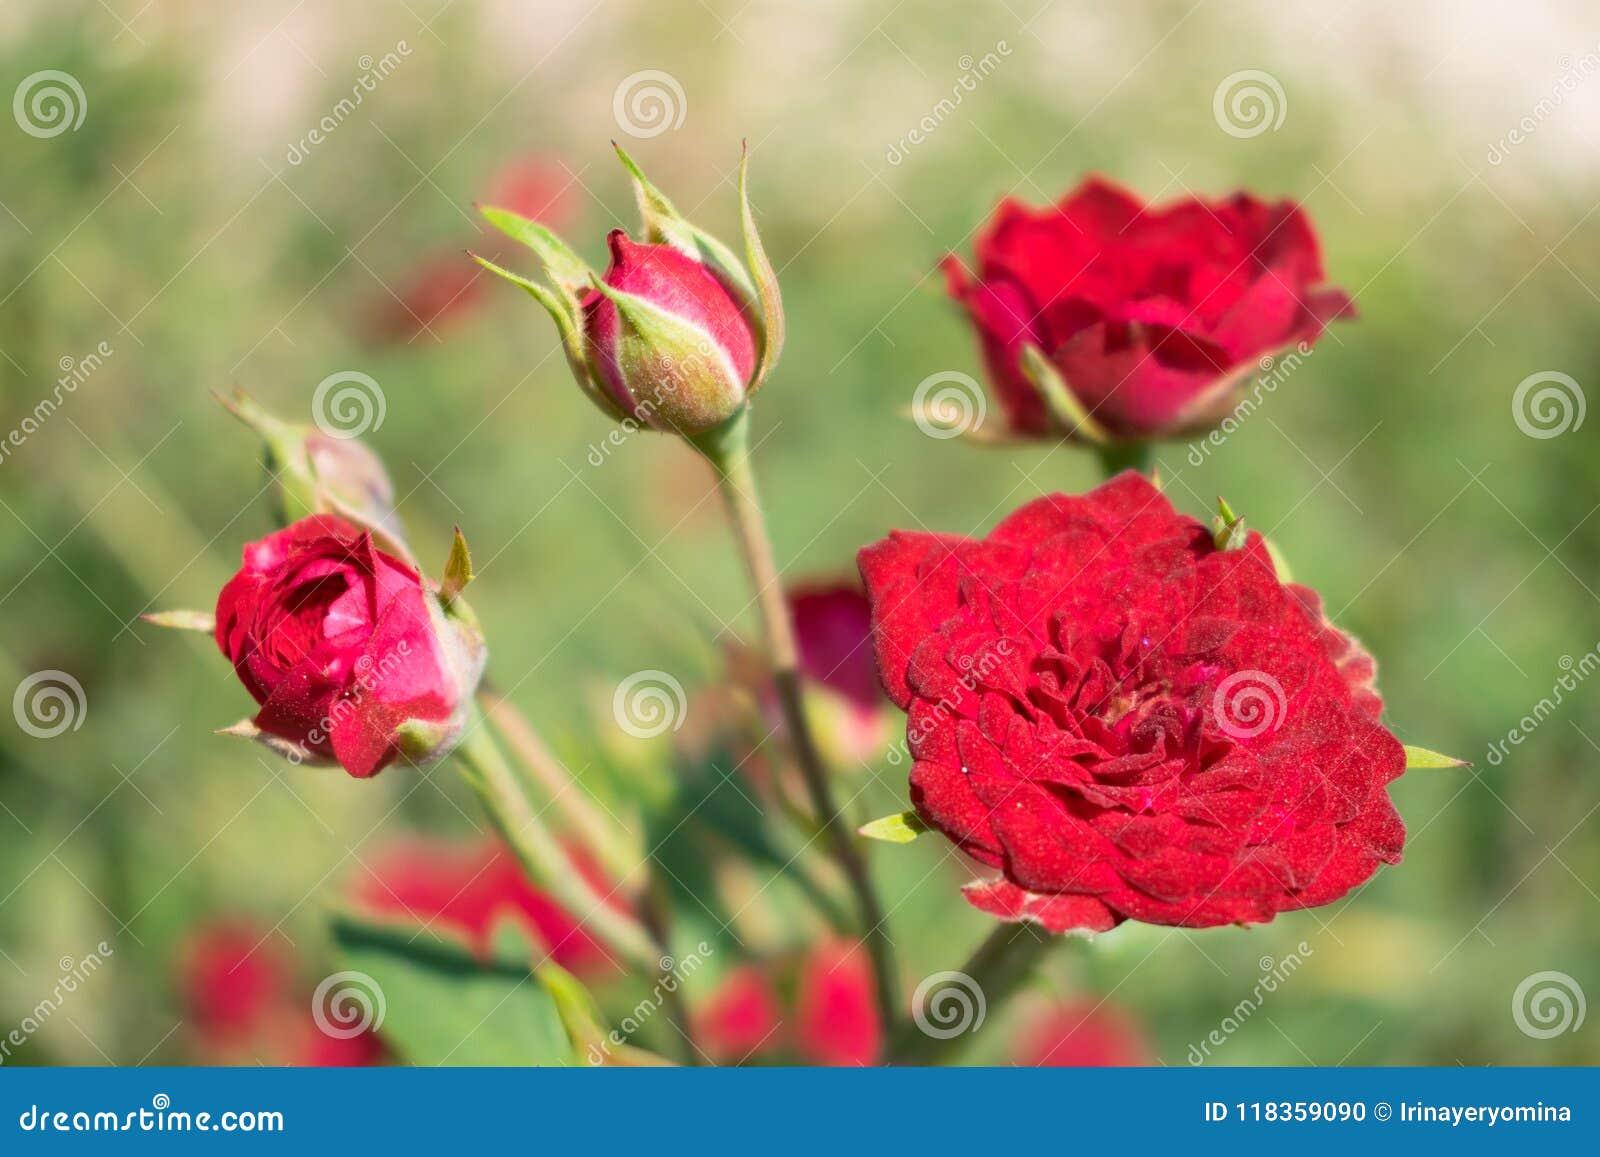 Red Cascade miniature rose bred. Close up of red mini roses, Pygmy Rose. Dark red blooming cultivar miniature rose (Rosa) in